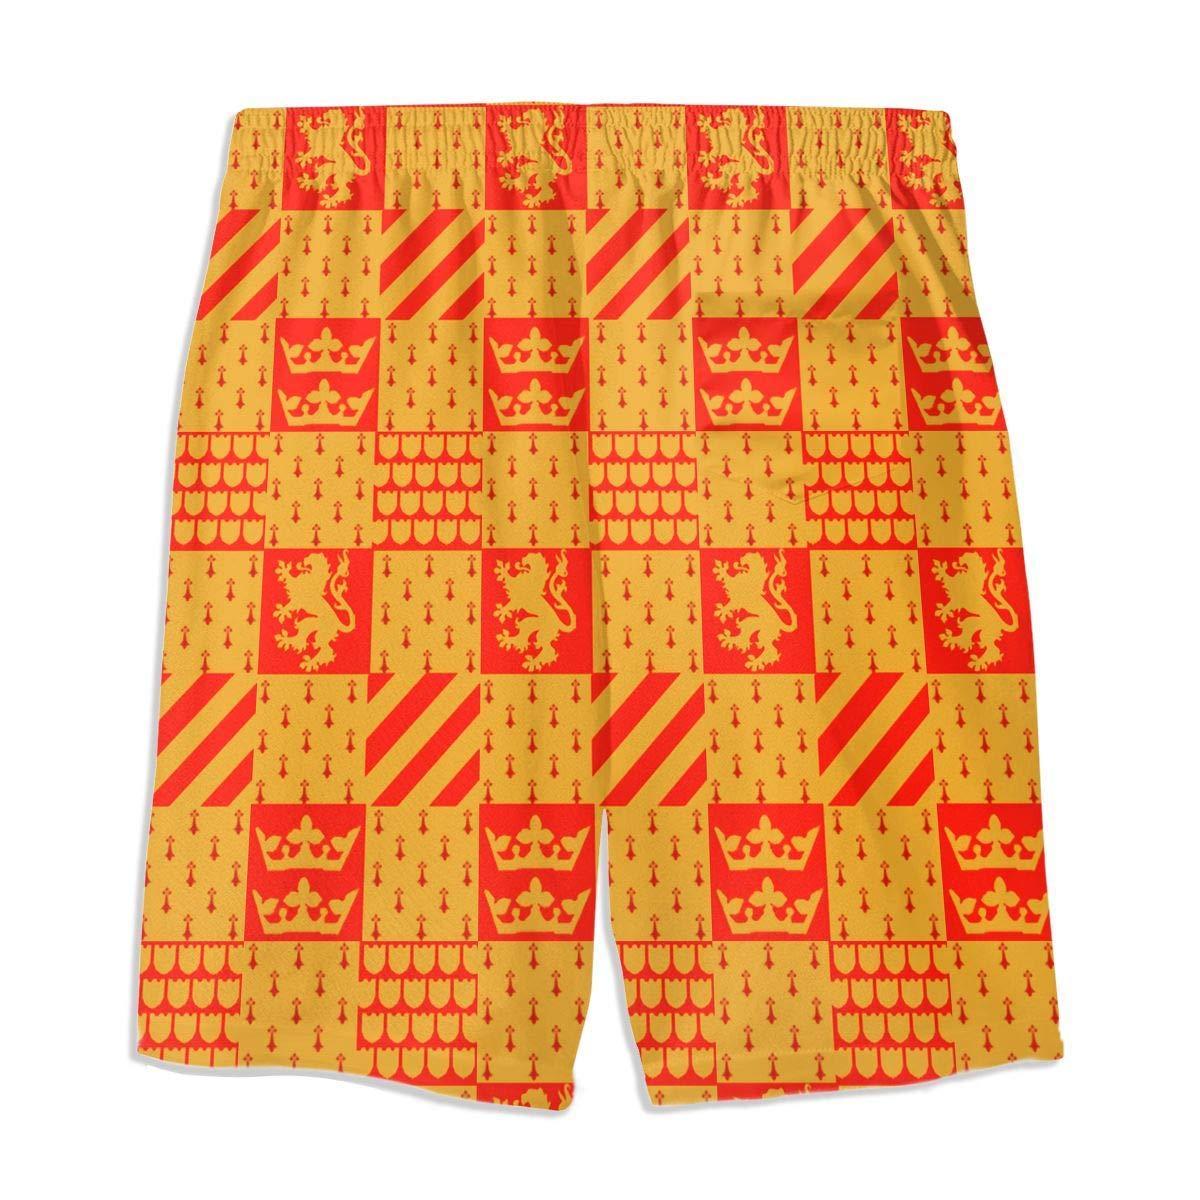 HFSST Chinese Lion Gules Teen Swim Trunks Bathing Suit Shorts Board Beach